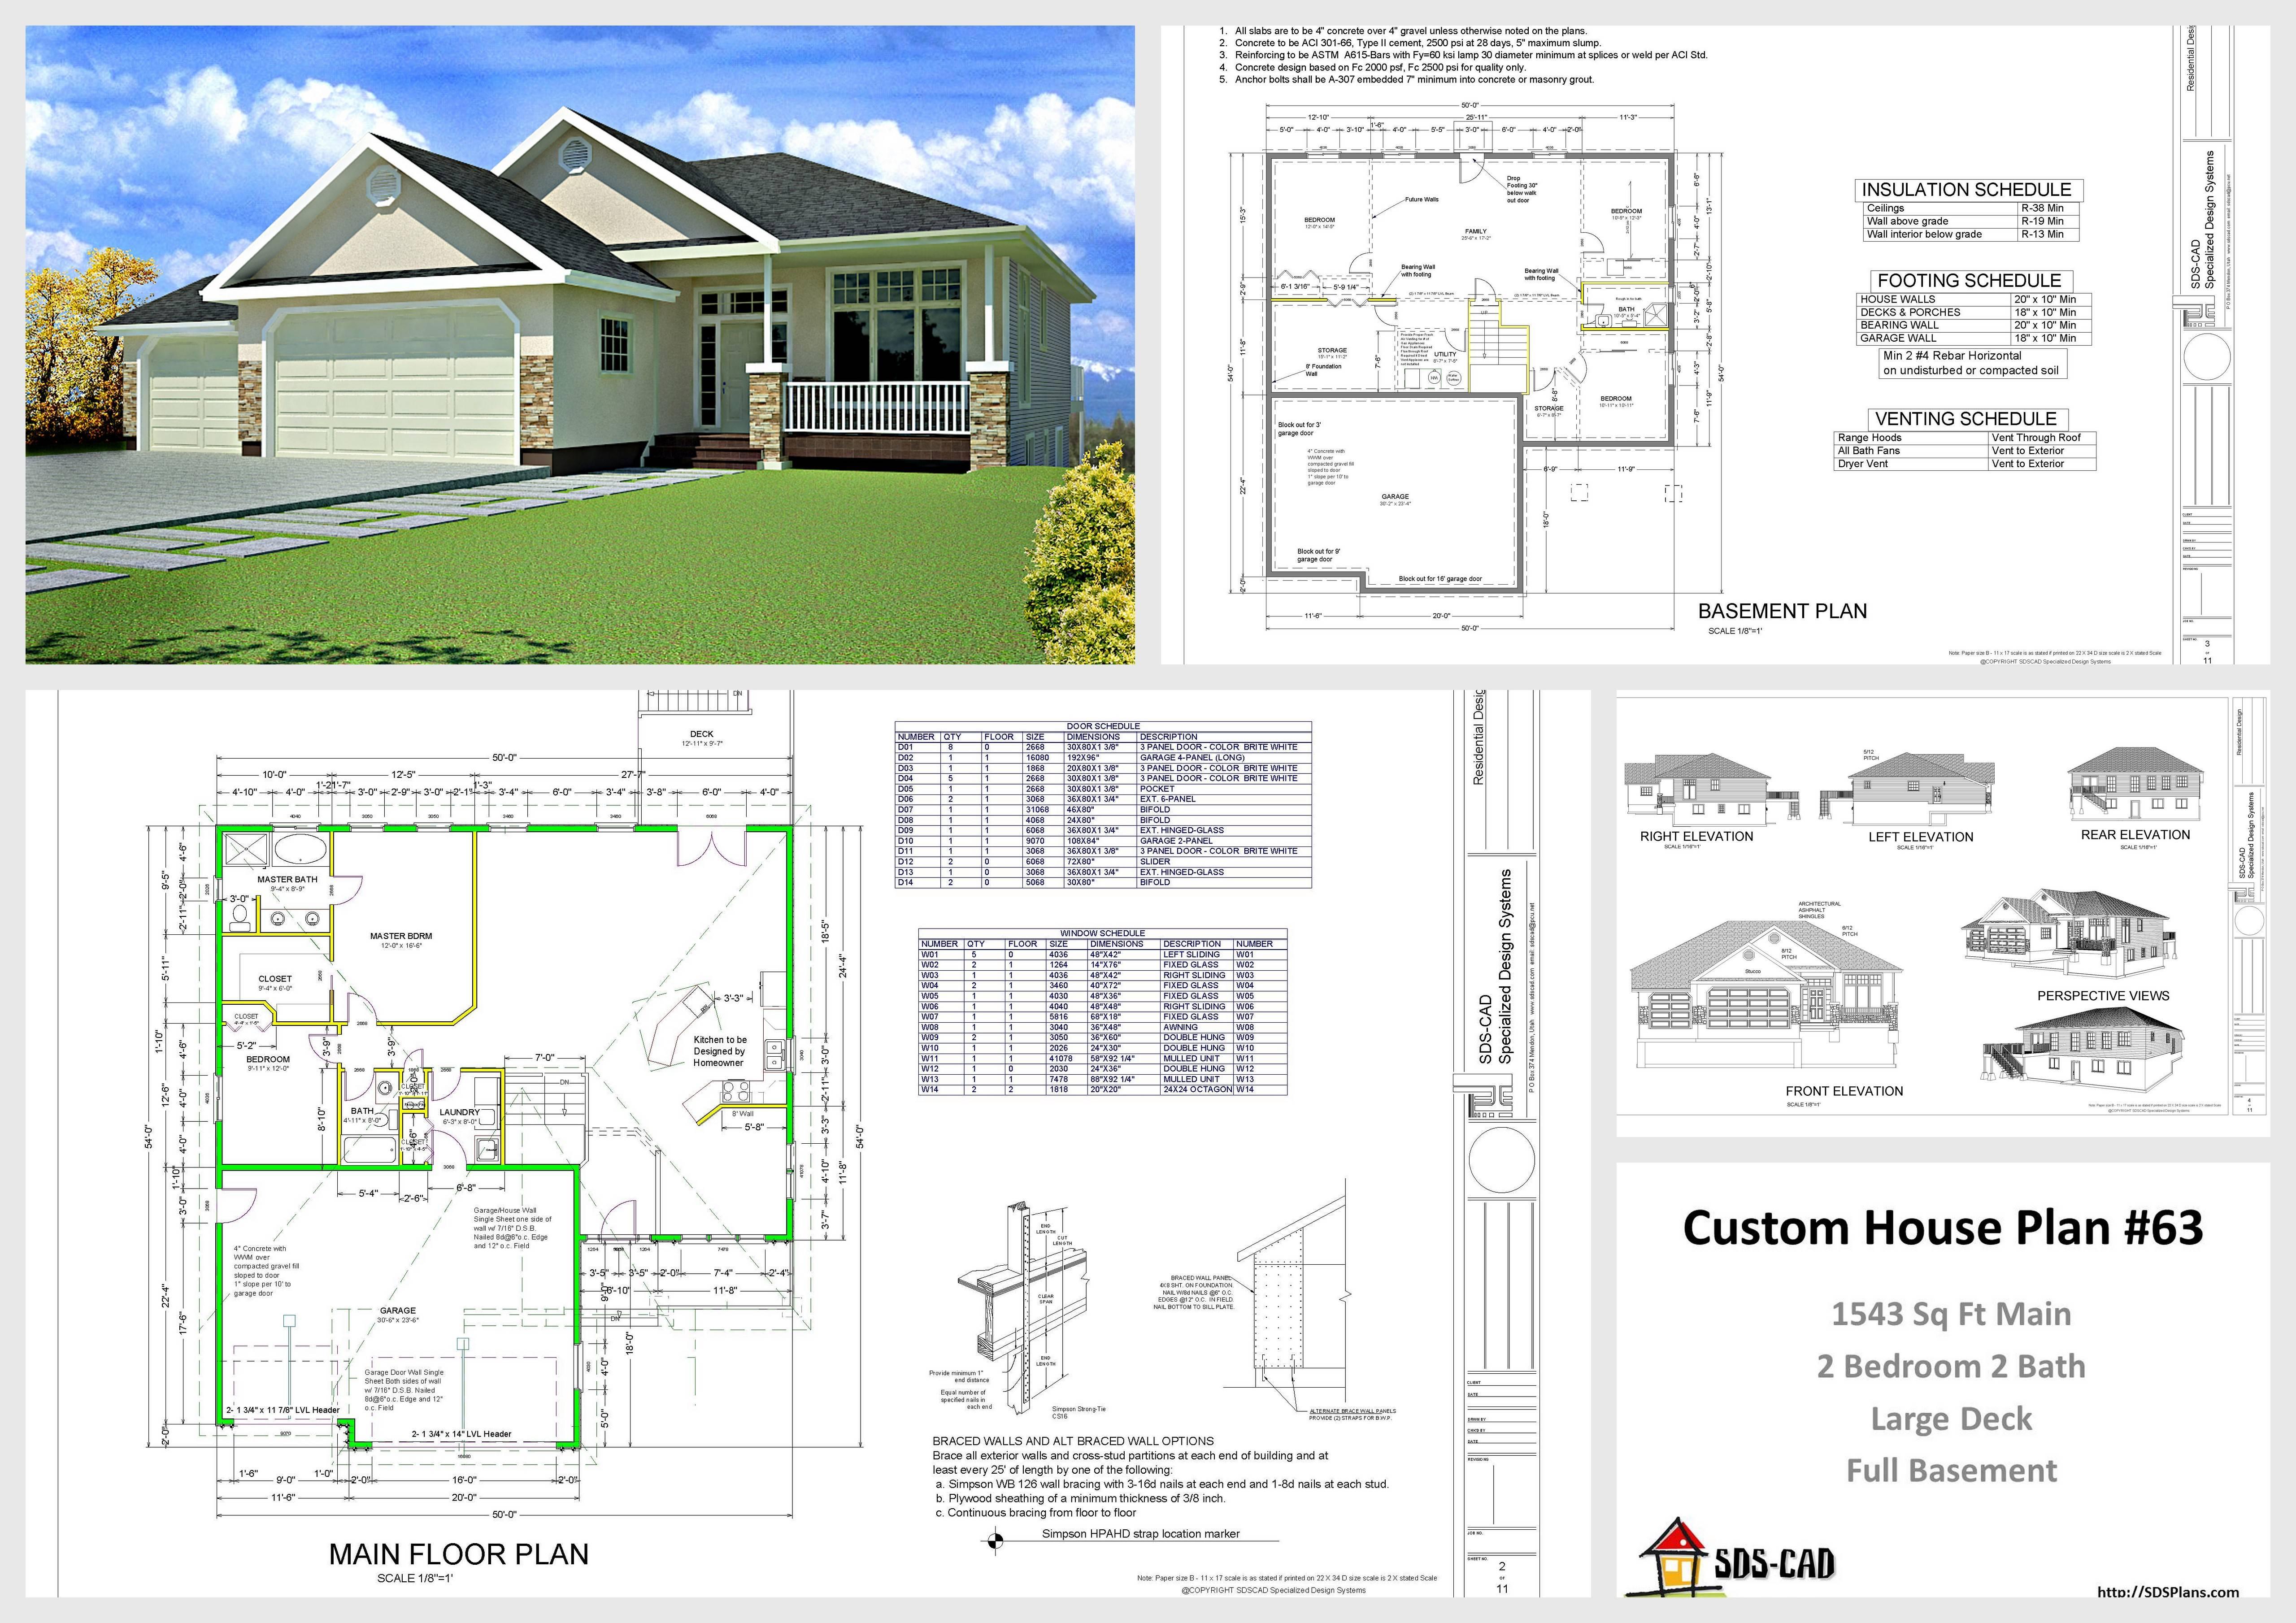 Cad Home Plans